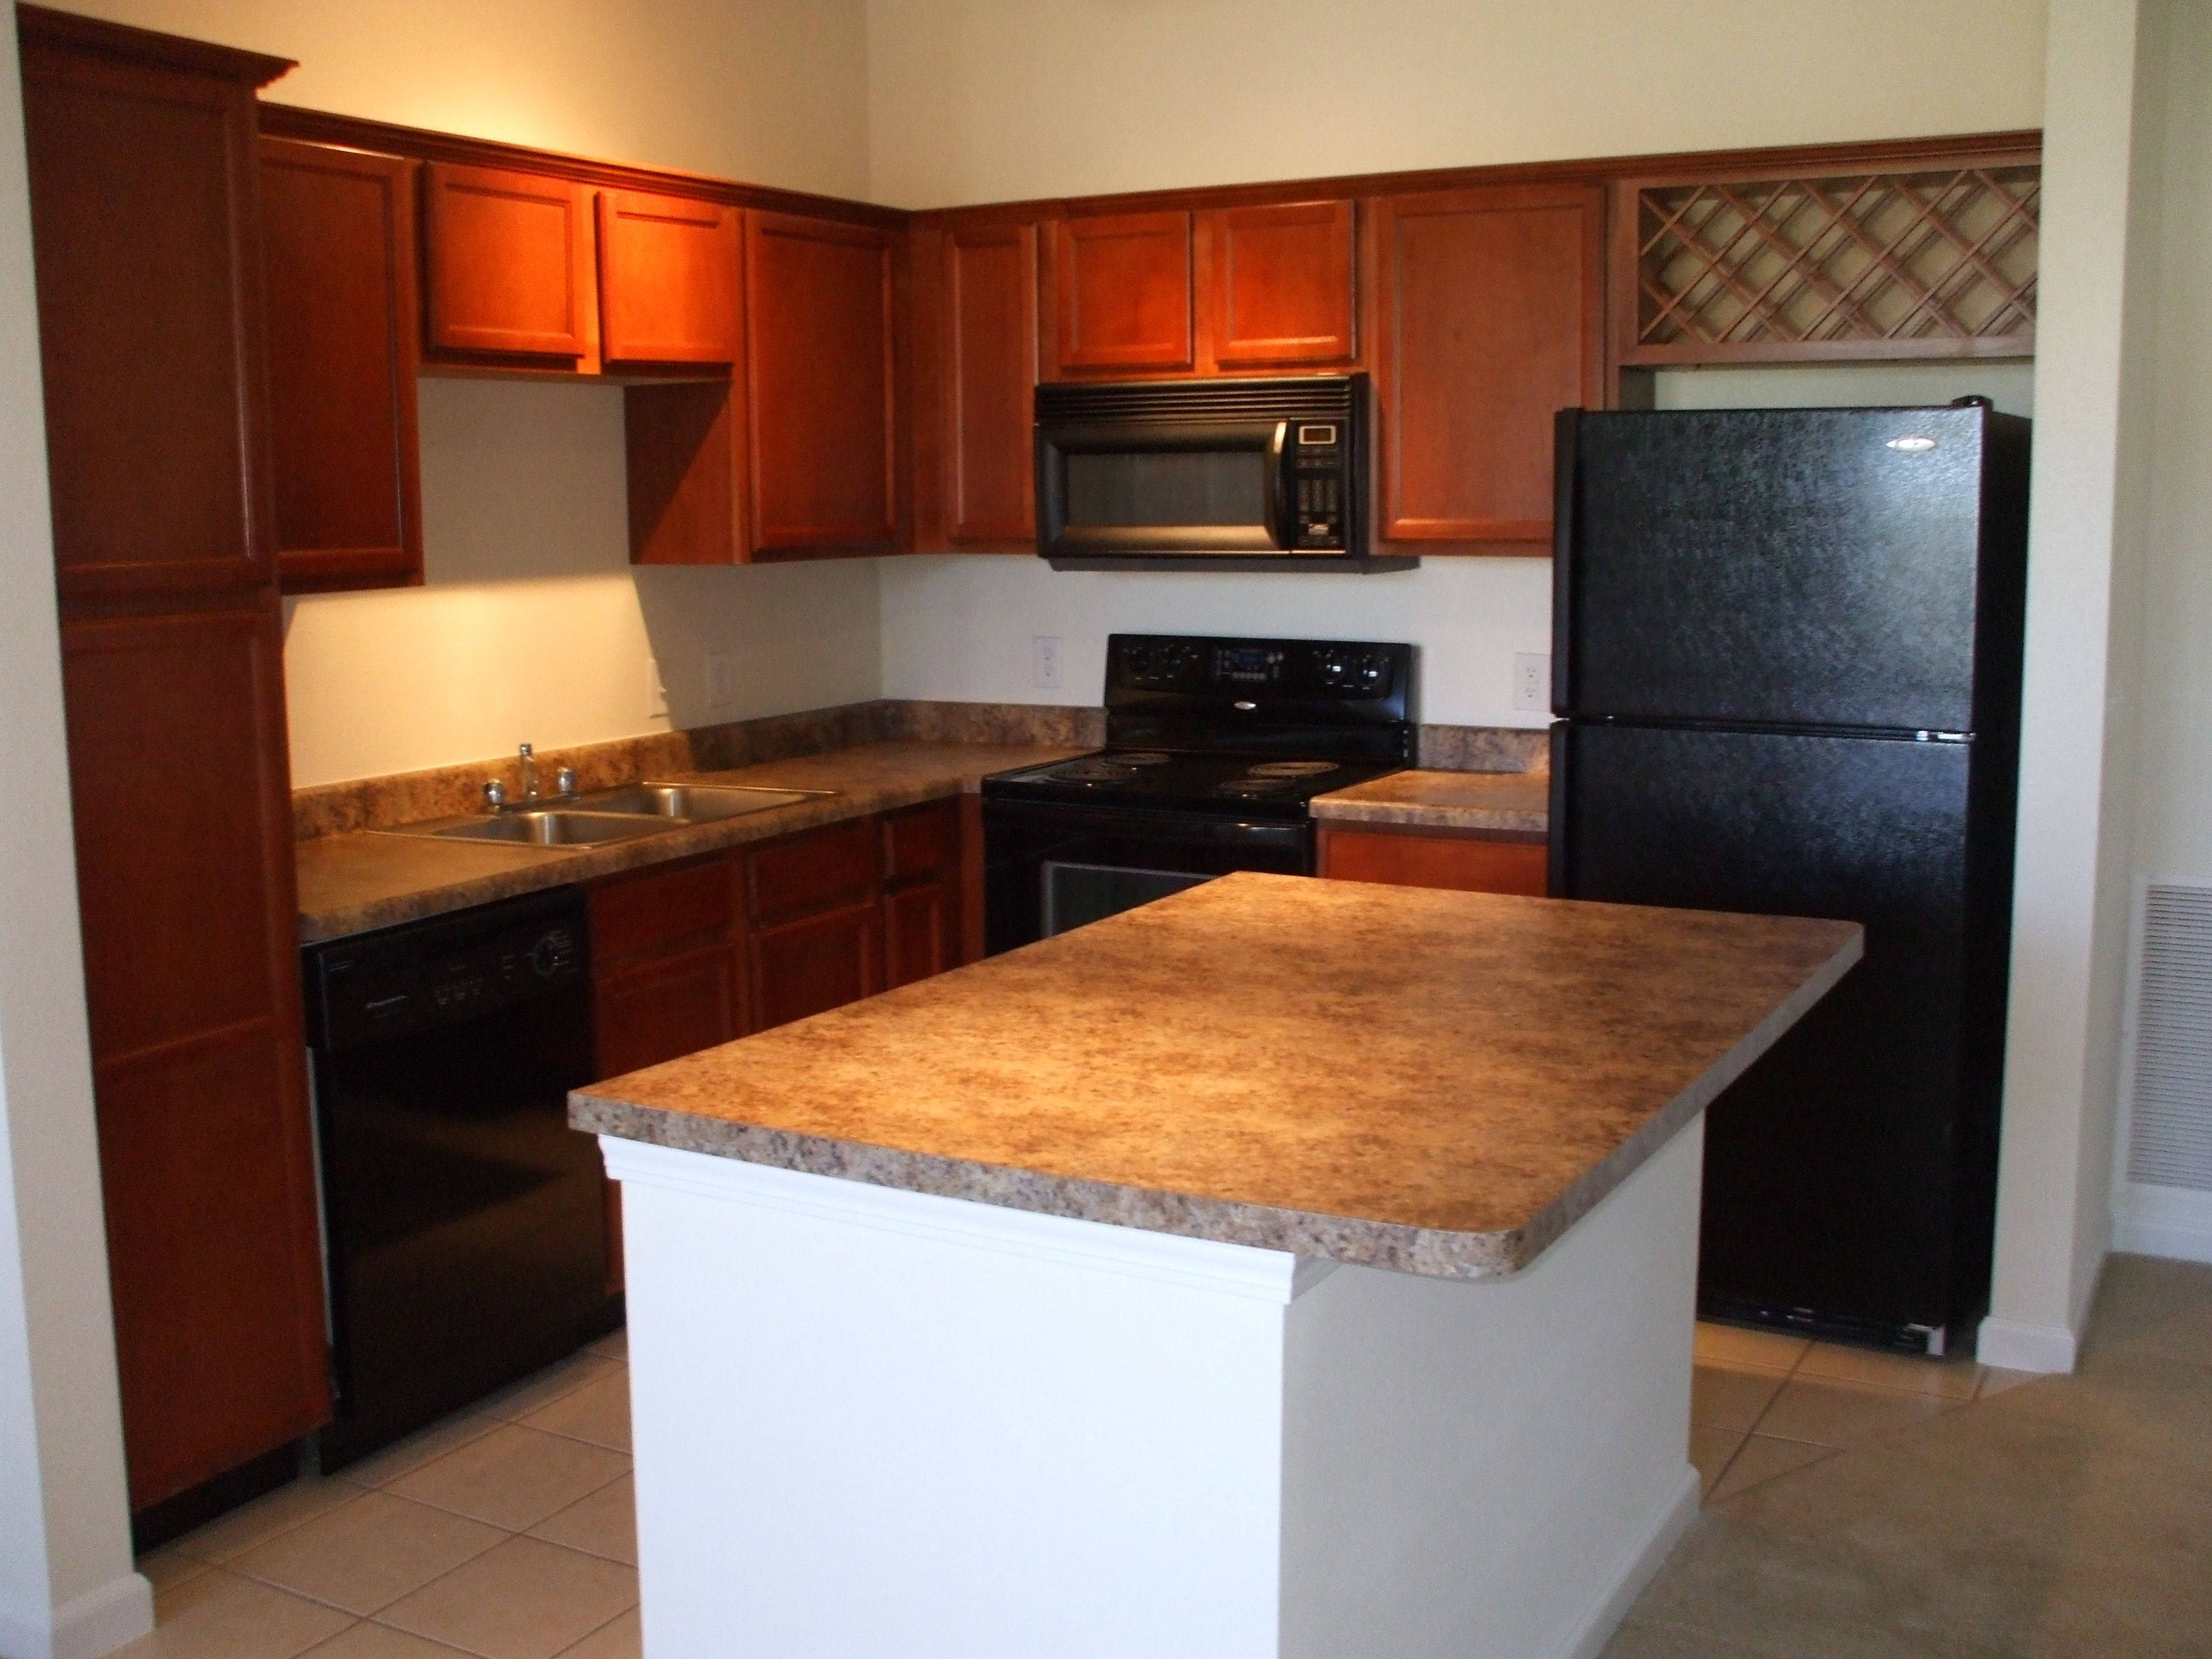 Island Kitchen Wall Street 1154 Sq Ft Kitchen Kitchen